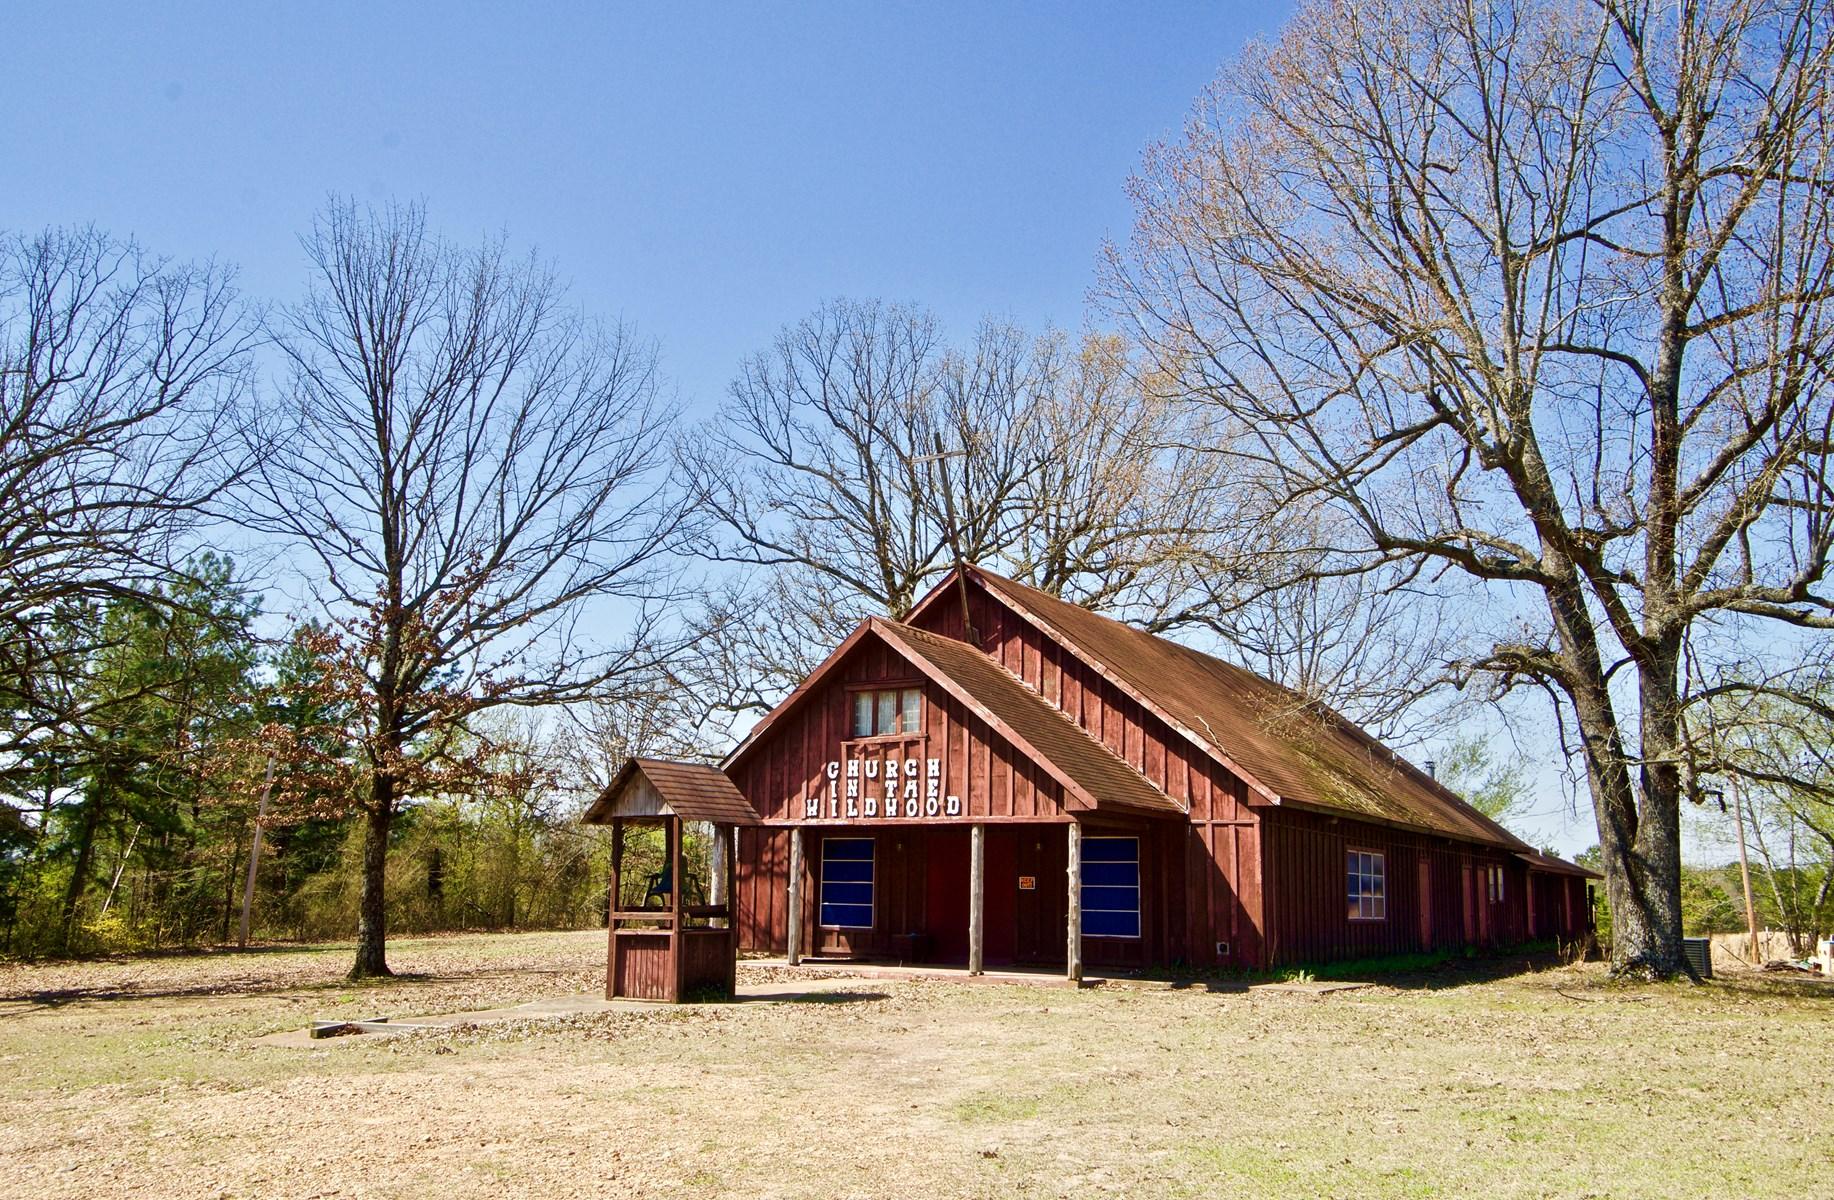 WILDWOOD CHURCH & 5 ACRES, WINTHROP, AR